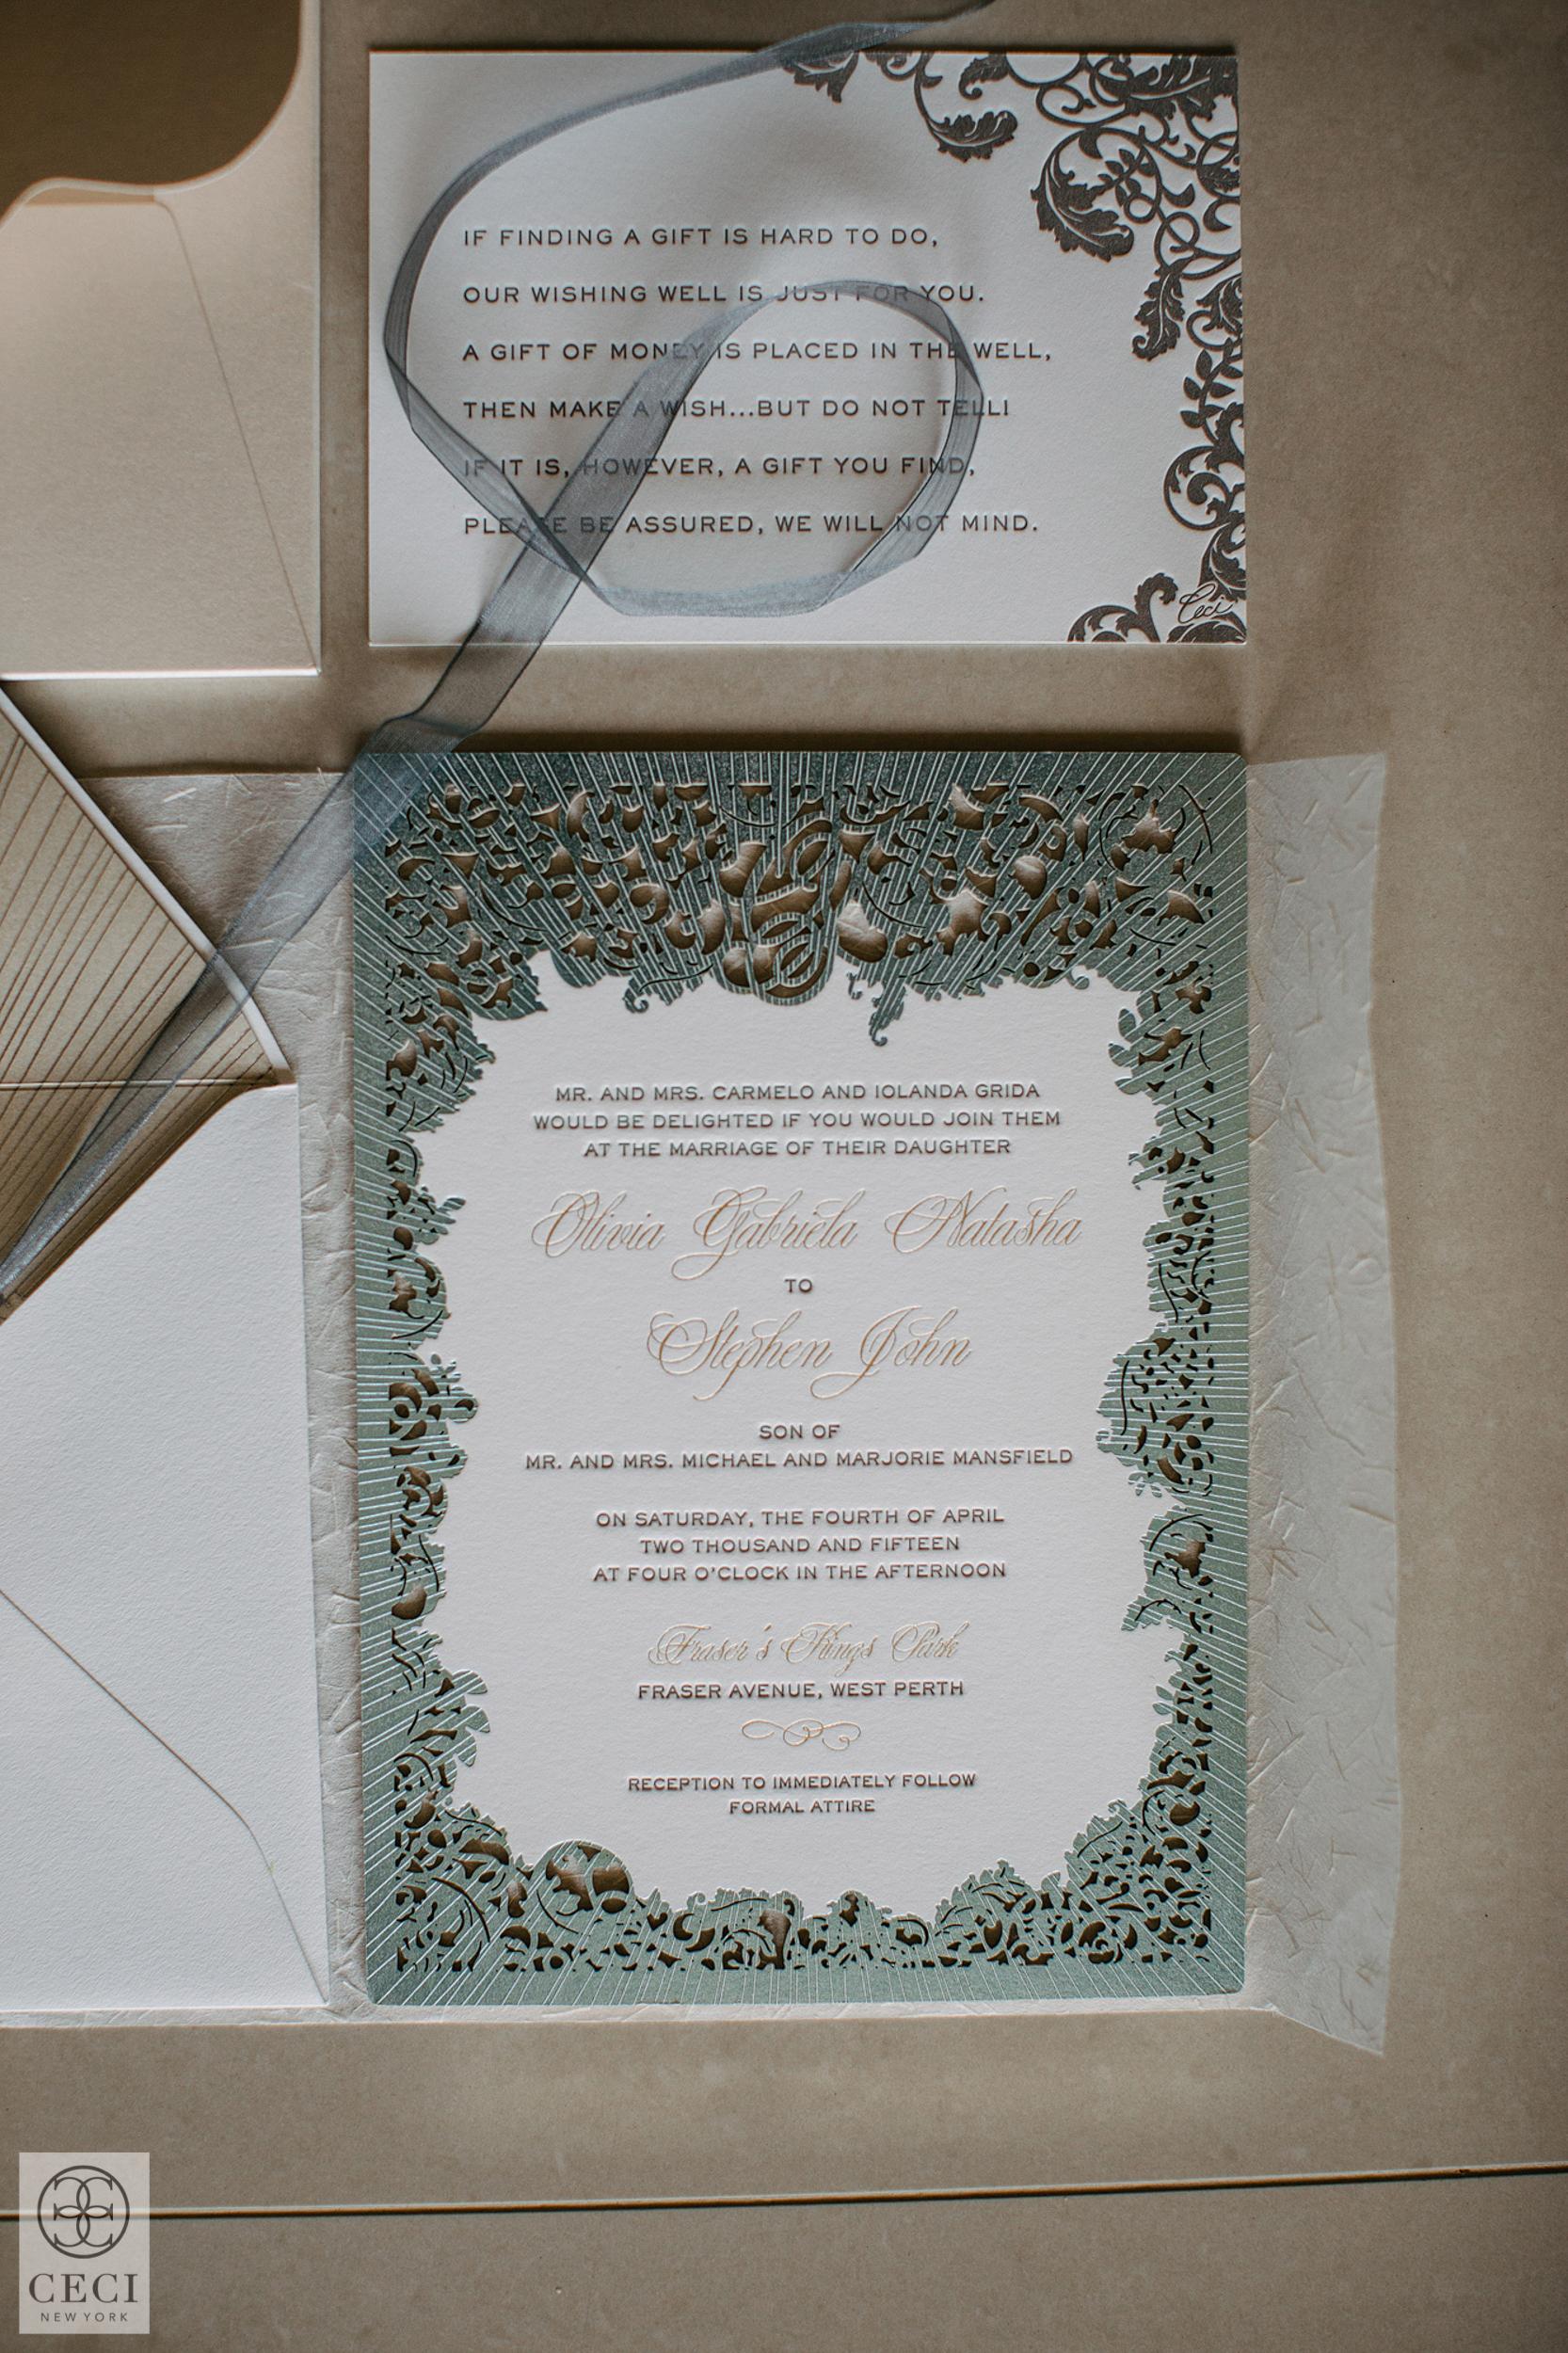 Ceci_New_York_Custom_Luxury_Wedding_BeautyShot_LaserCut_Stationery_Personalized_Couture_Foil_Stamping_Perth_Destination_Australia_Chic_-4.jpg